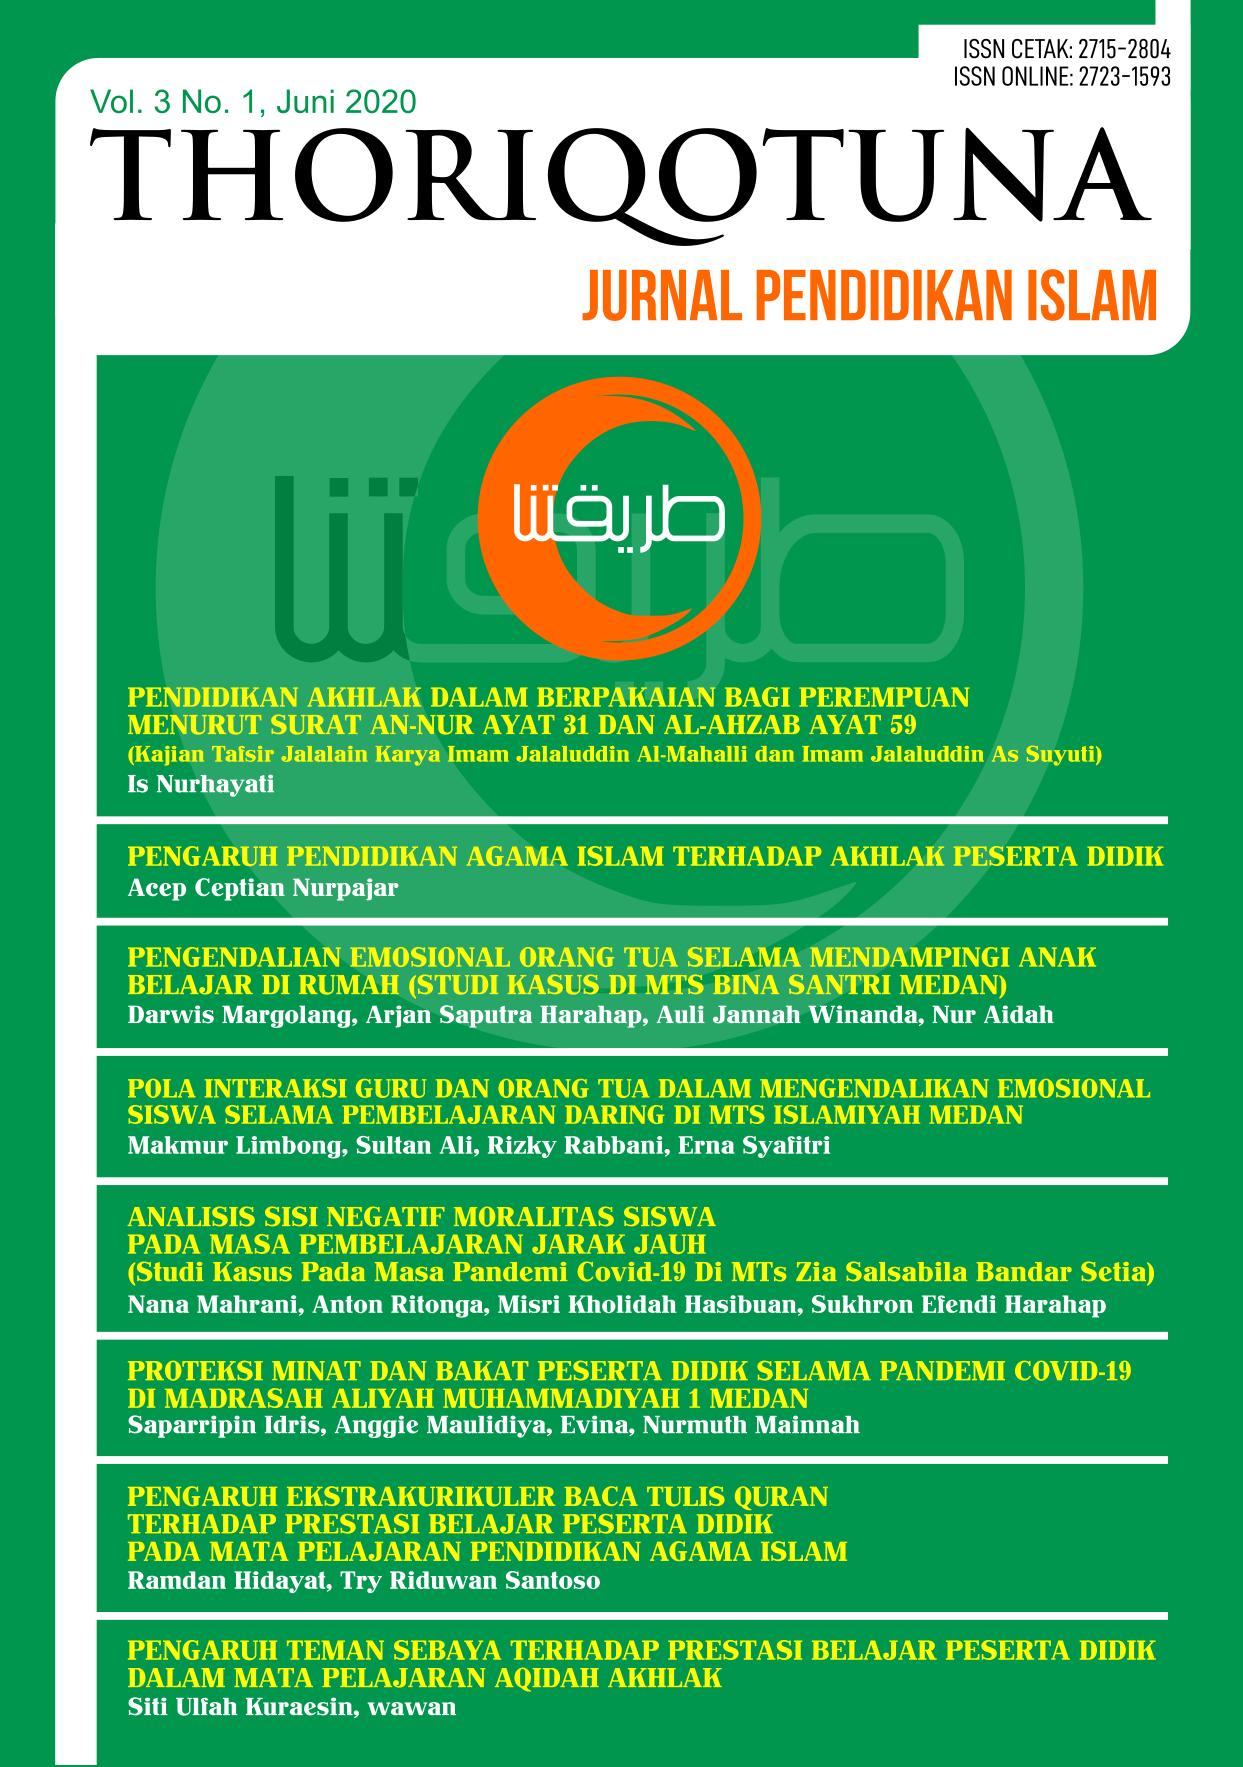 cover thoriqotuna: jurnal pendidikan islam